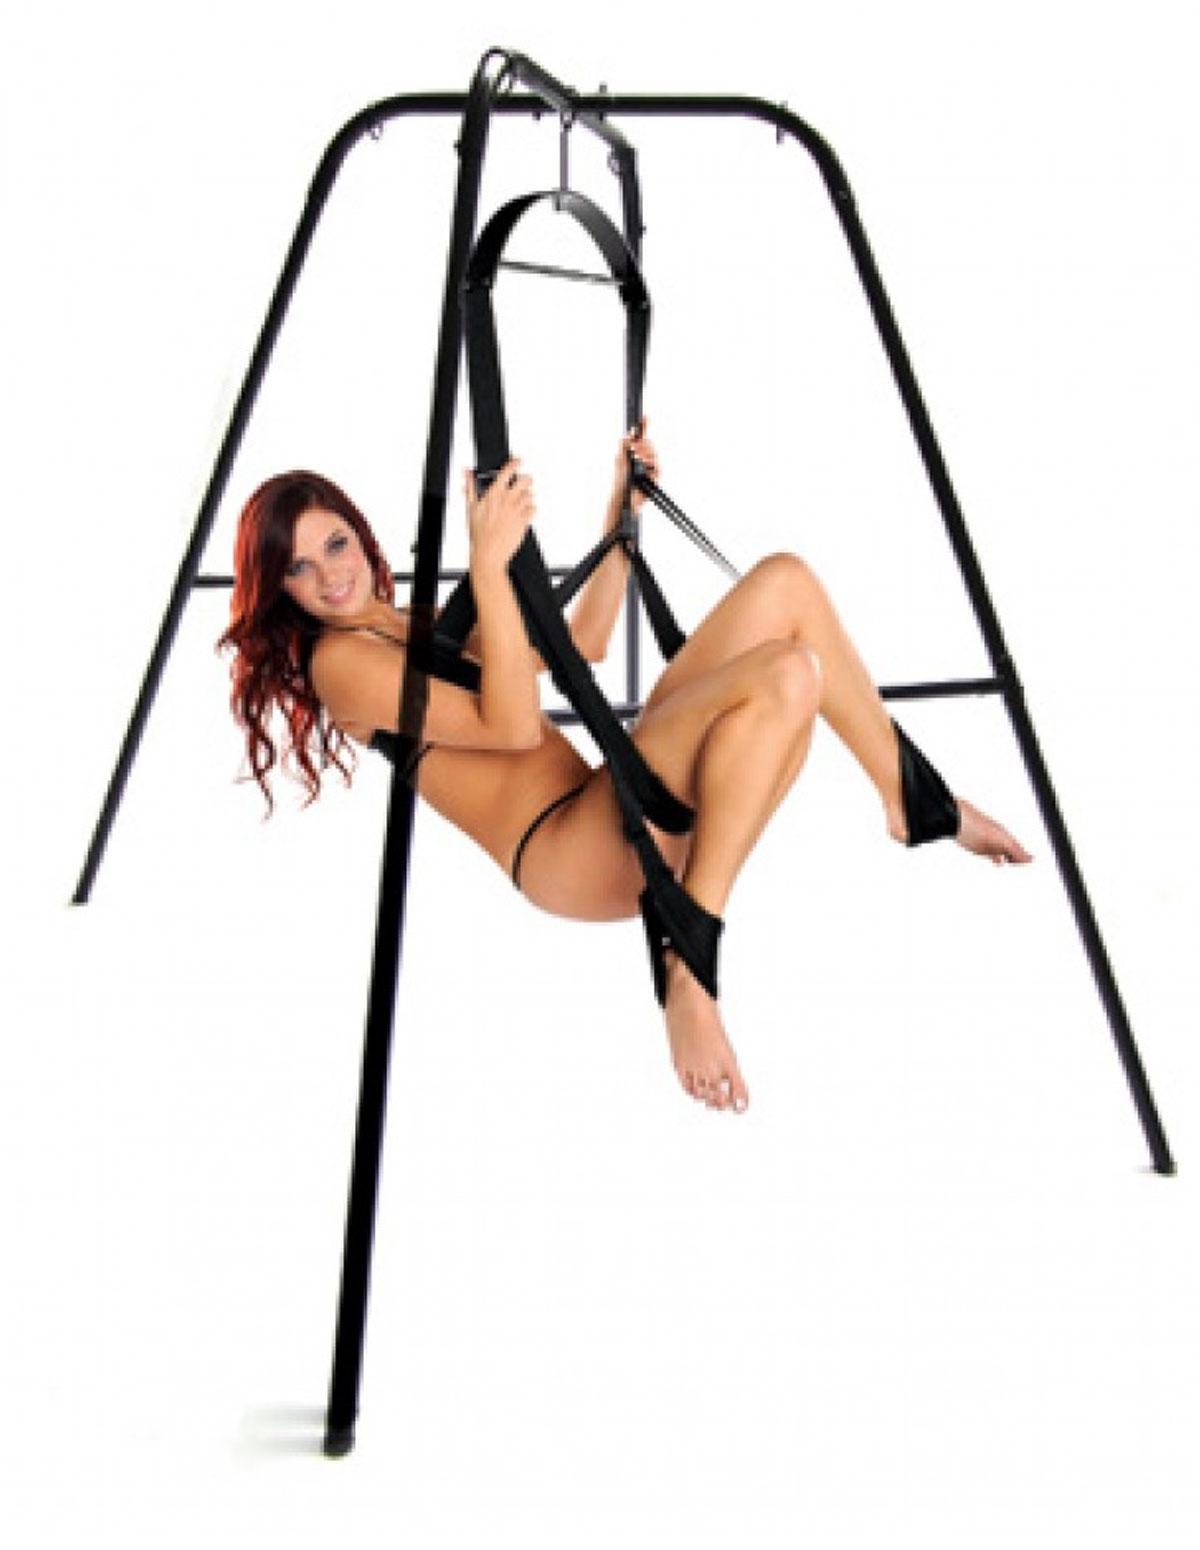 360 Spinning Sex Swing